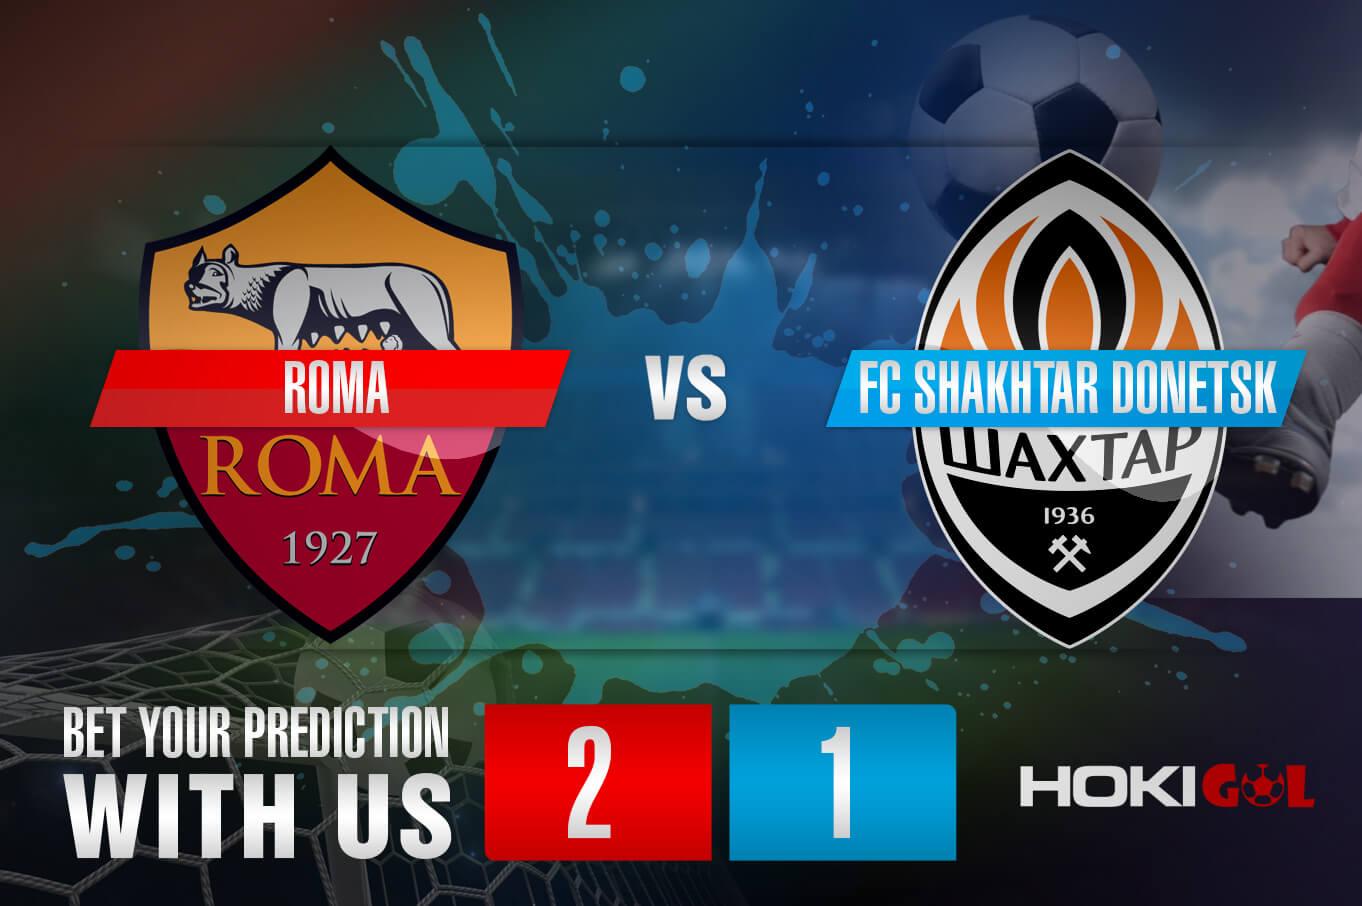 Prediksi Bola Roma Vs FC Shakhtar Donetsk 12 Maret 2021